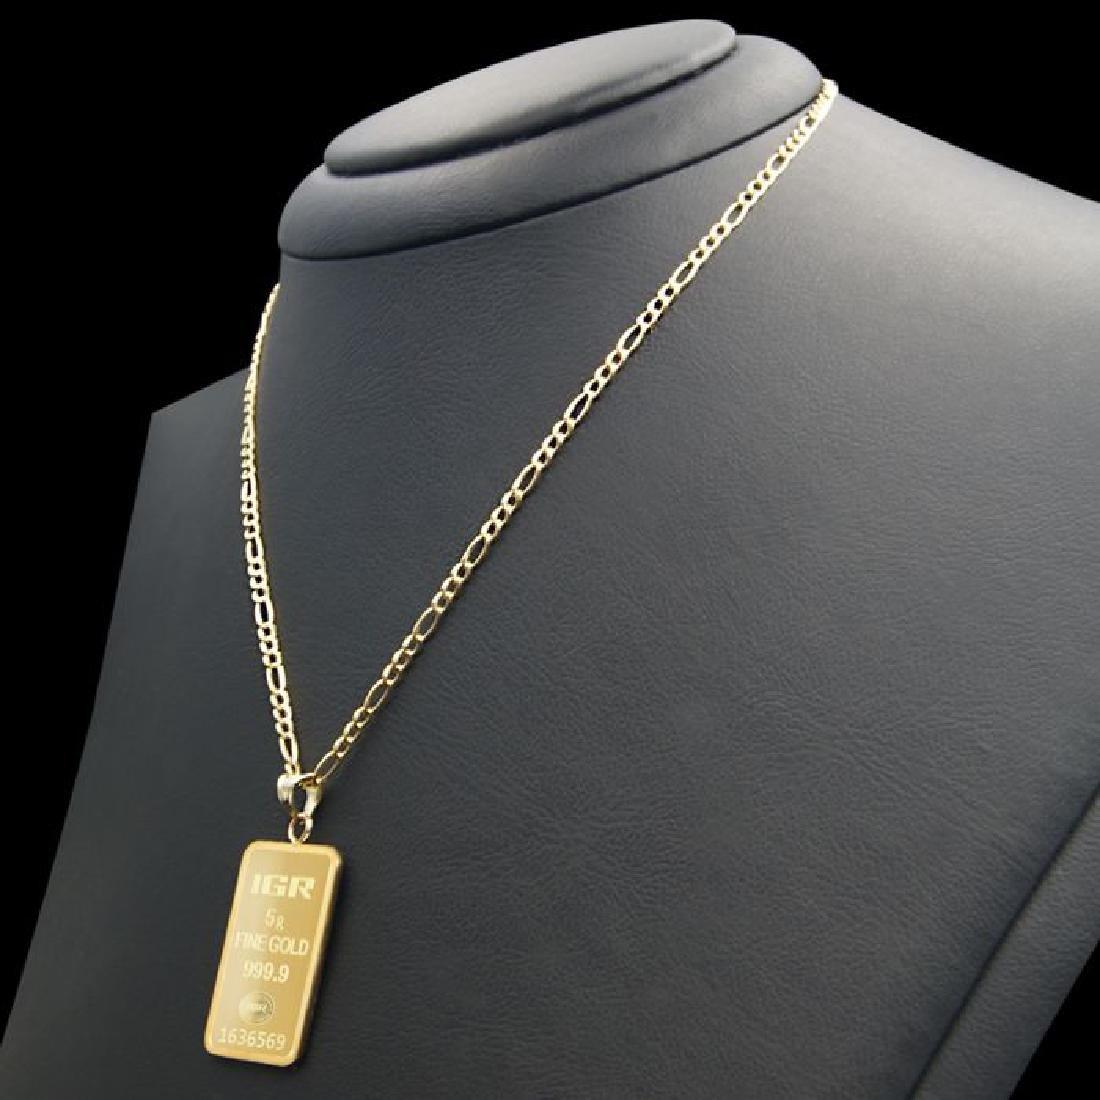 5 gr. pendant + 2 gr. chain. -  999/1000 & 585/1000 (14 - 2